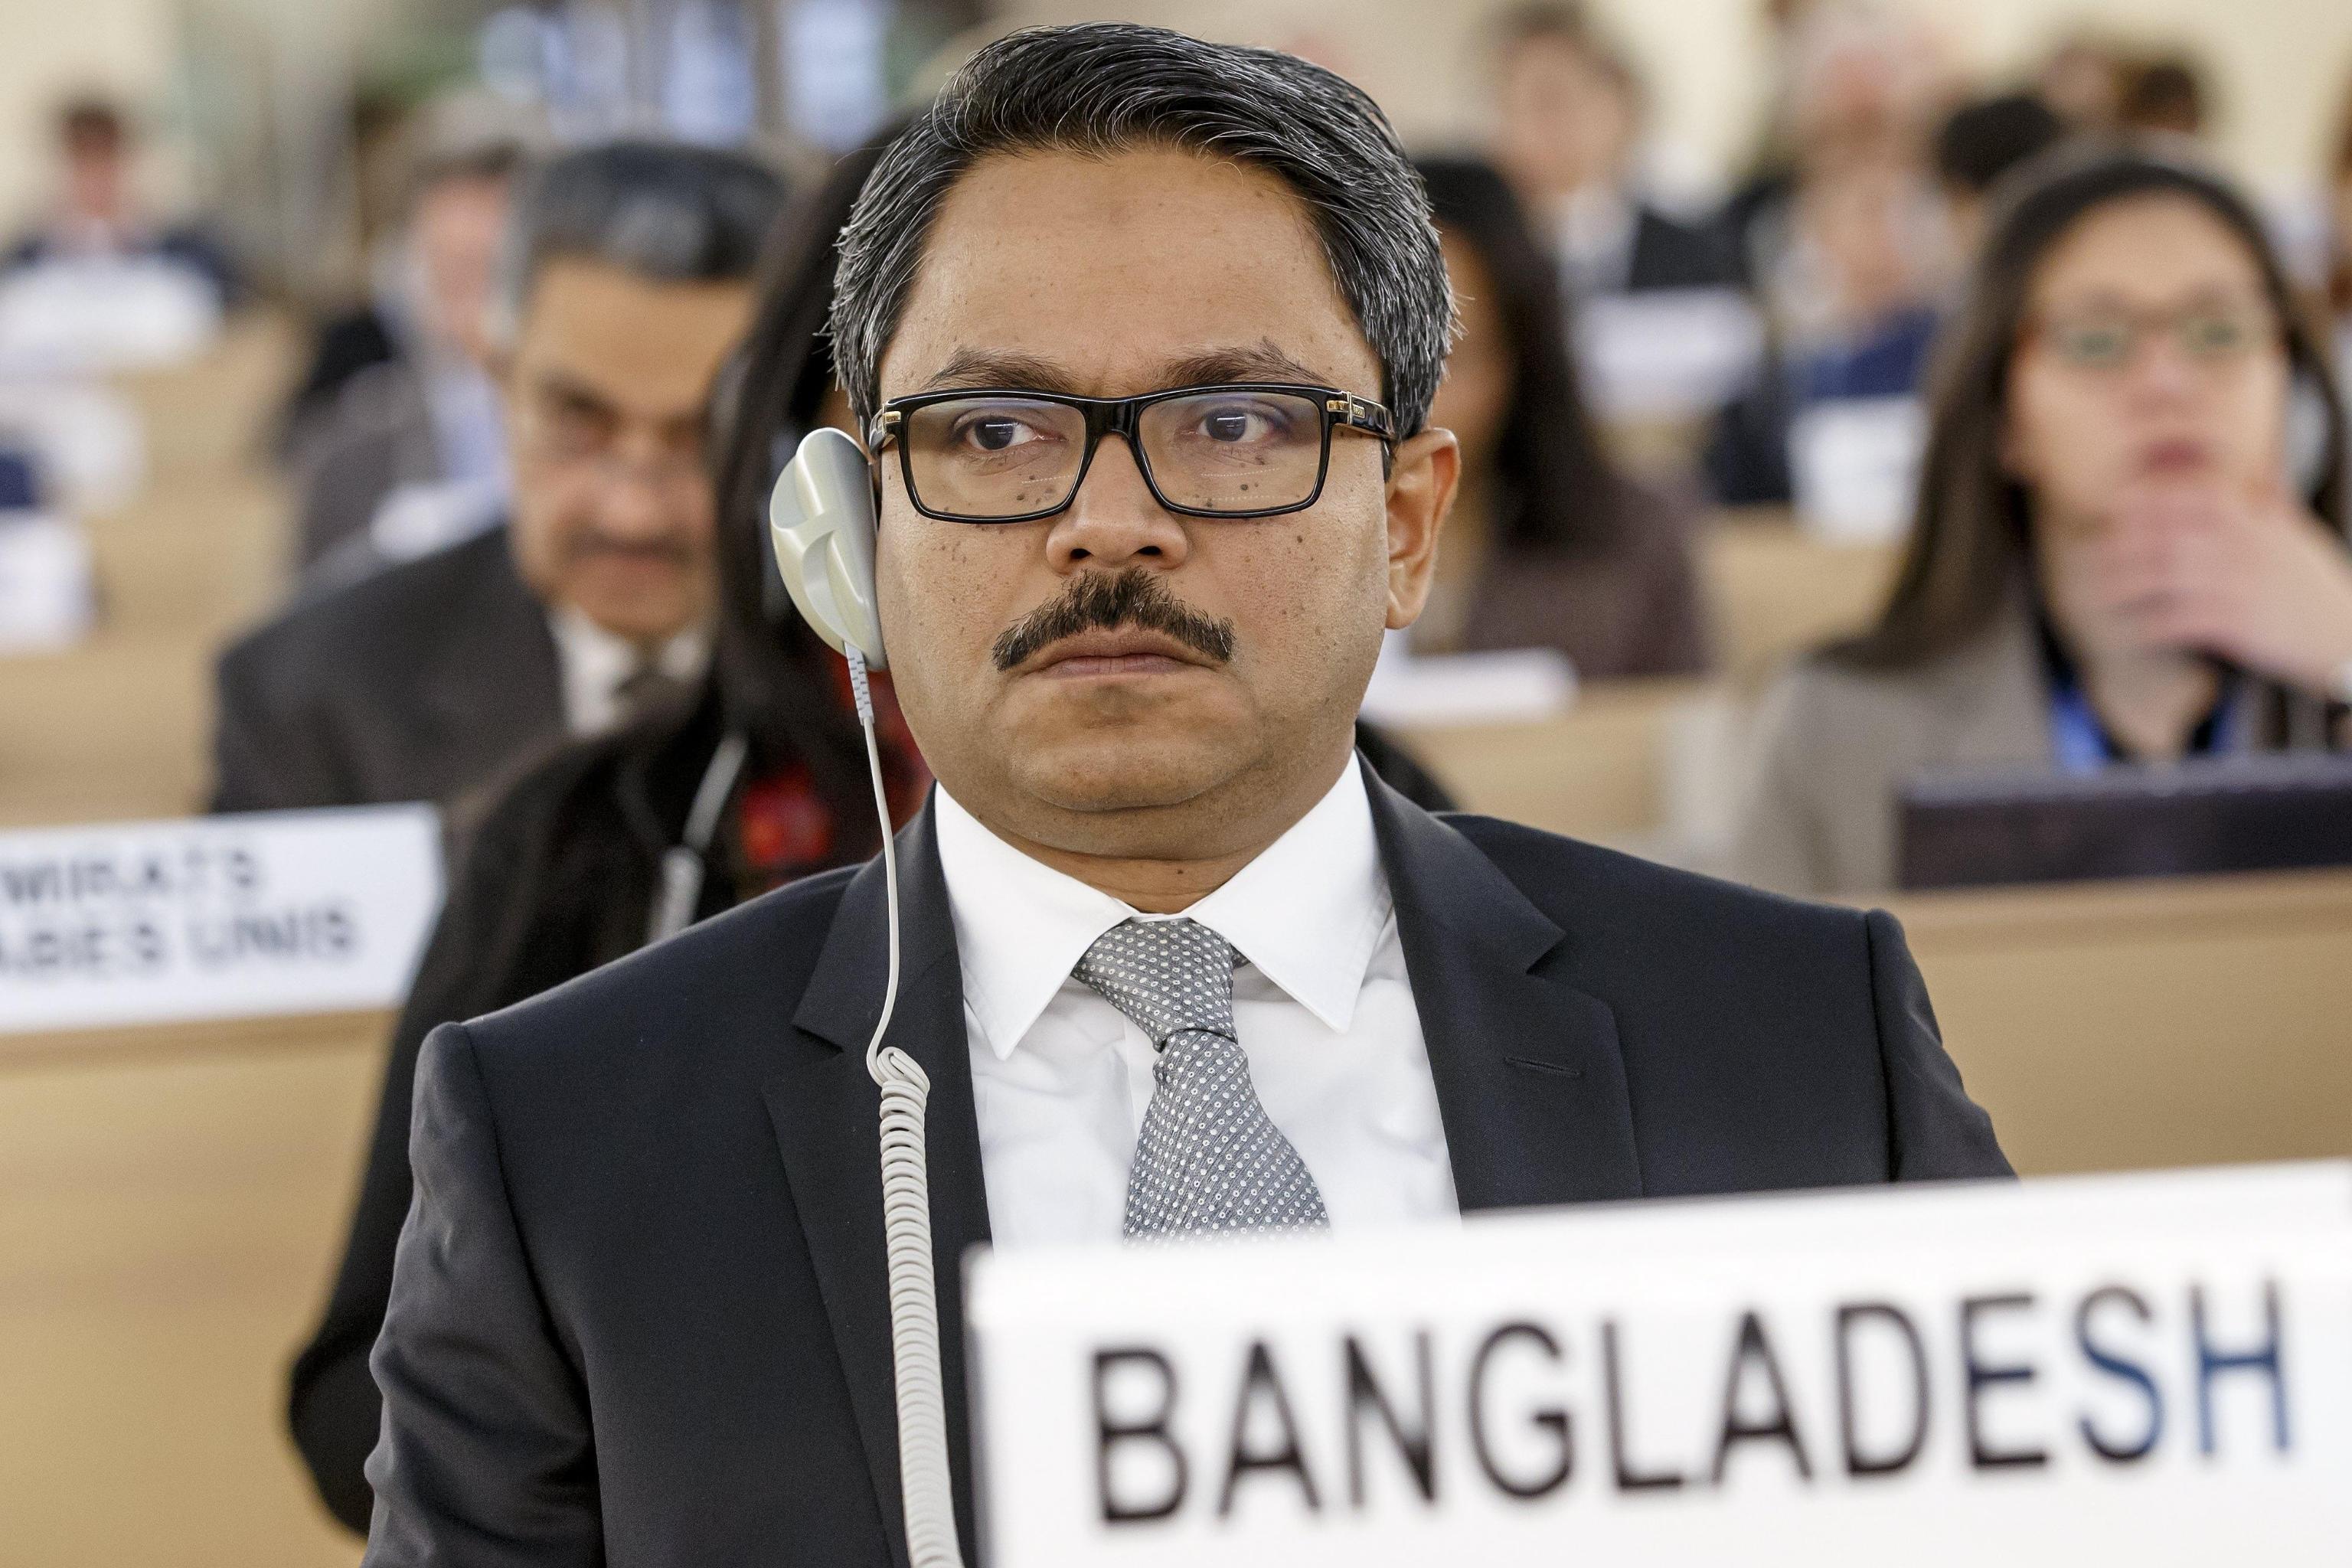 New York: Bangladesh condanna attentato